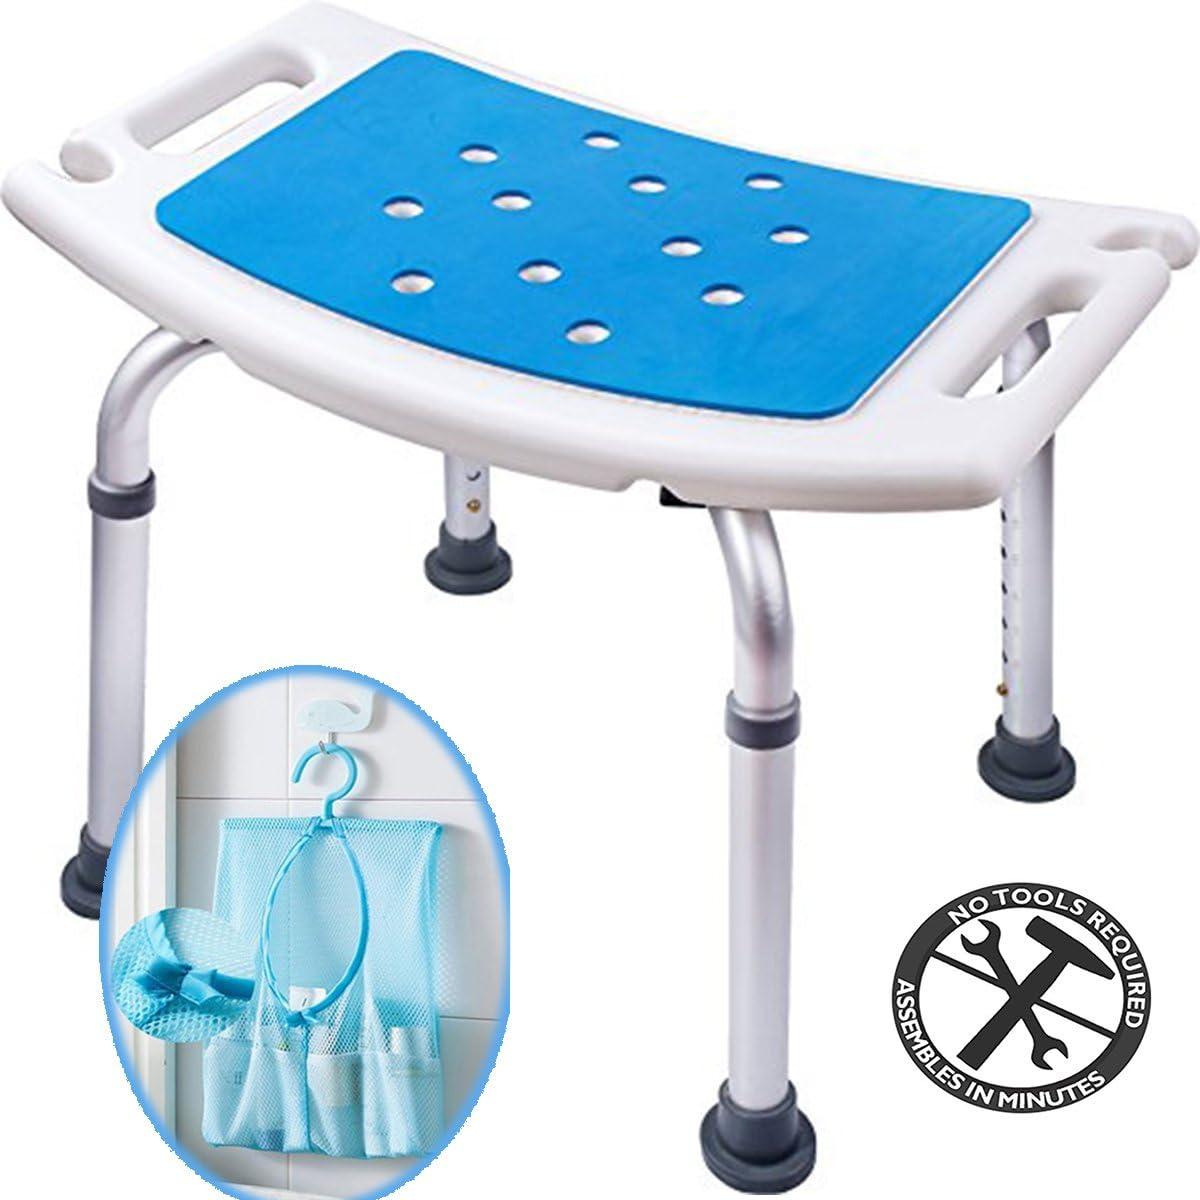 Medokare Shower Stool Padded Shower Chair With Handles For Bathtub Tote Bag Adjustable Tool Free Assembly Bathroom Stool Designed For Seniors Elderly Adults Furniture Decor